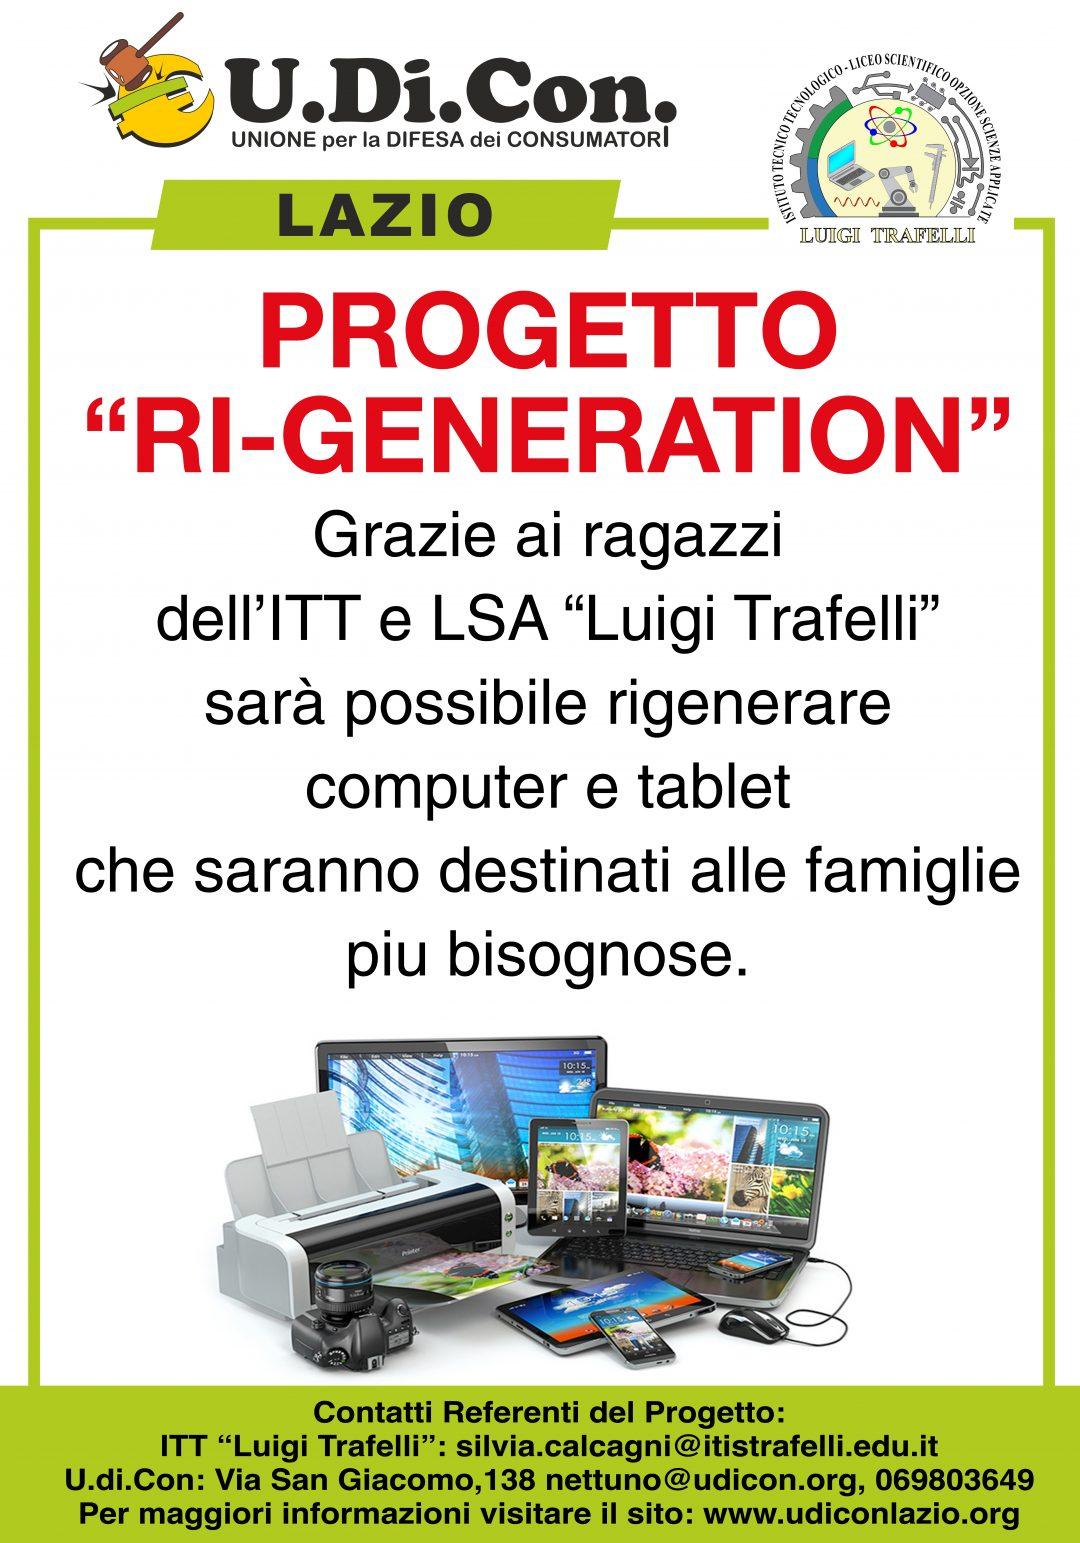 PCTO Ri-Generation